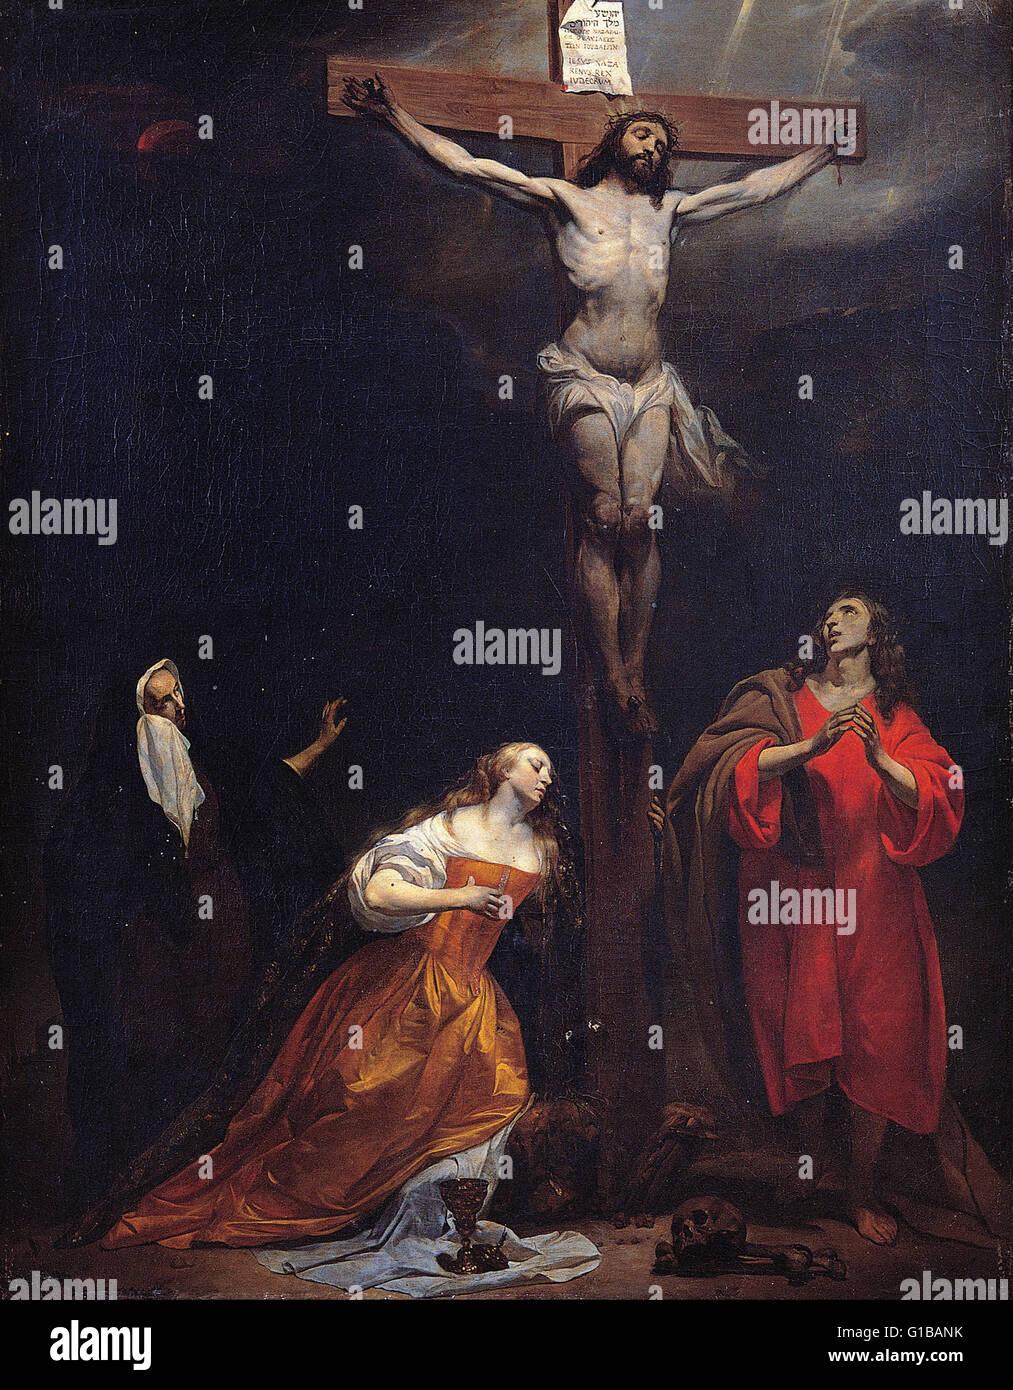 Gabriel Metsu - Crucifixion - Musei Capitolini Roma Stock Photo